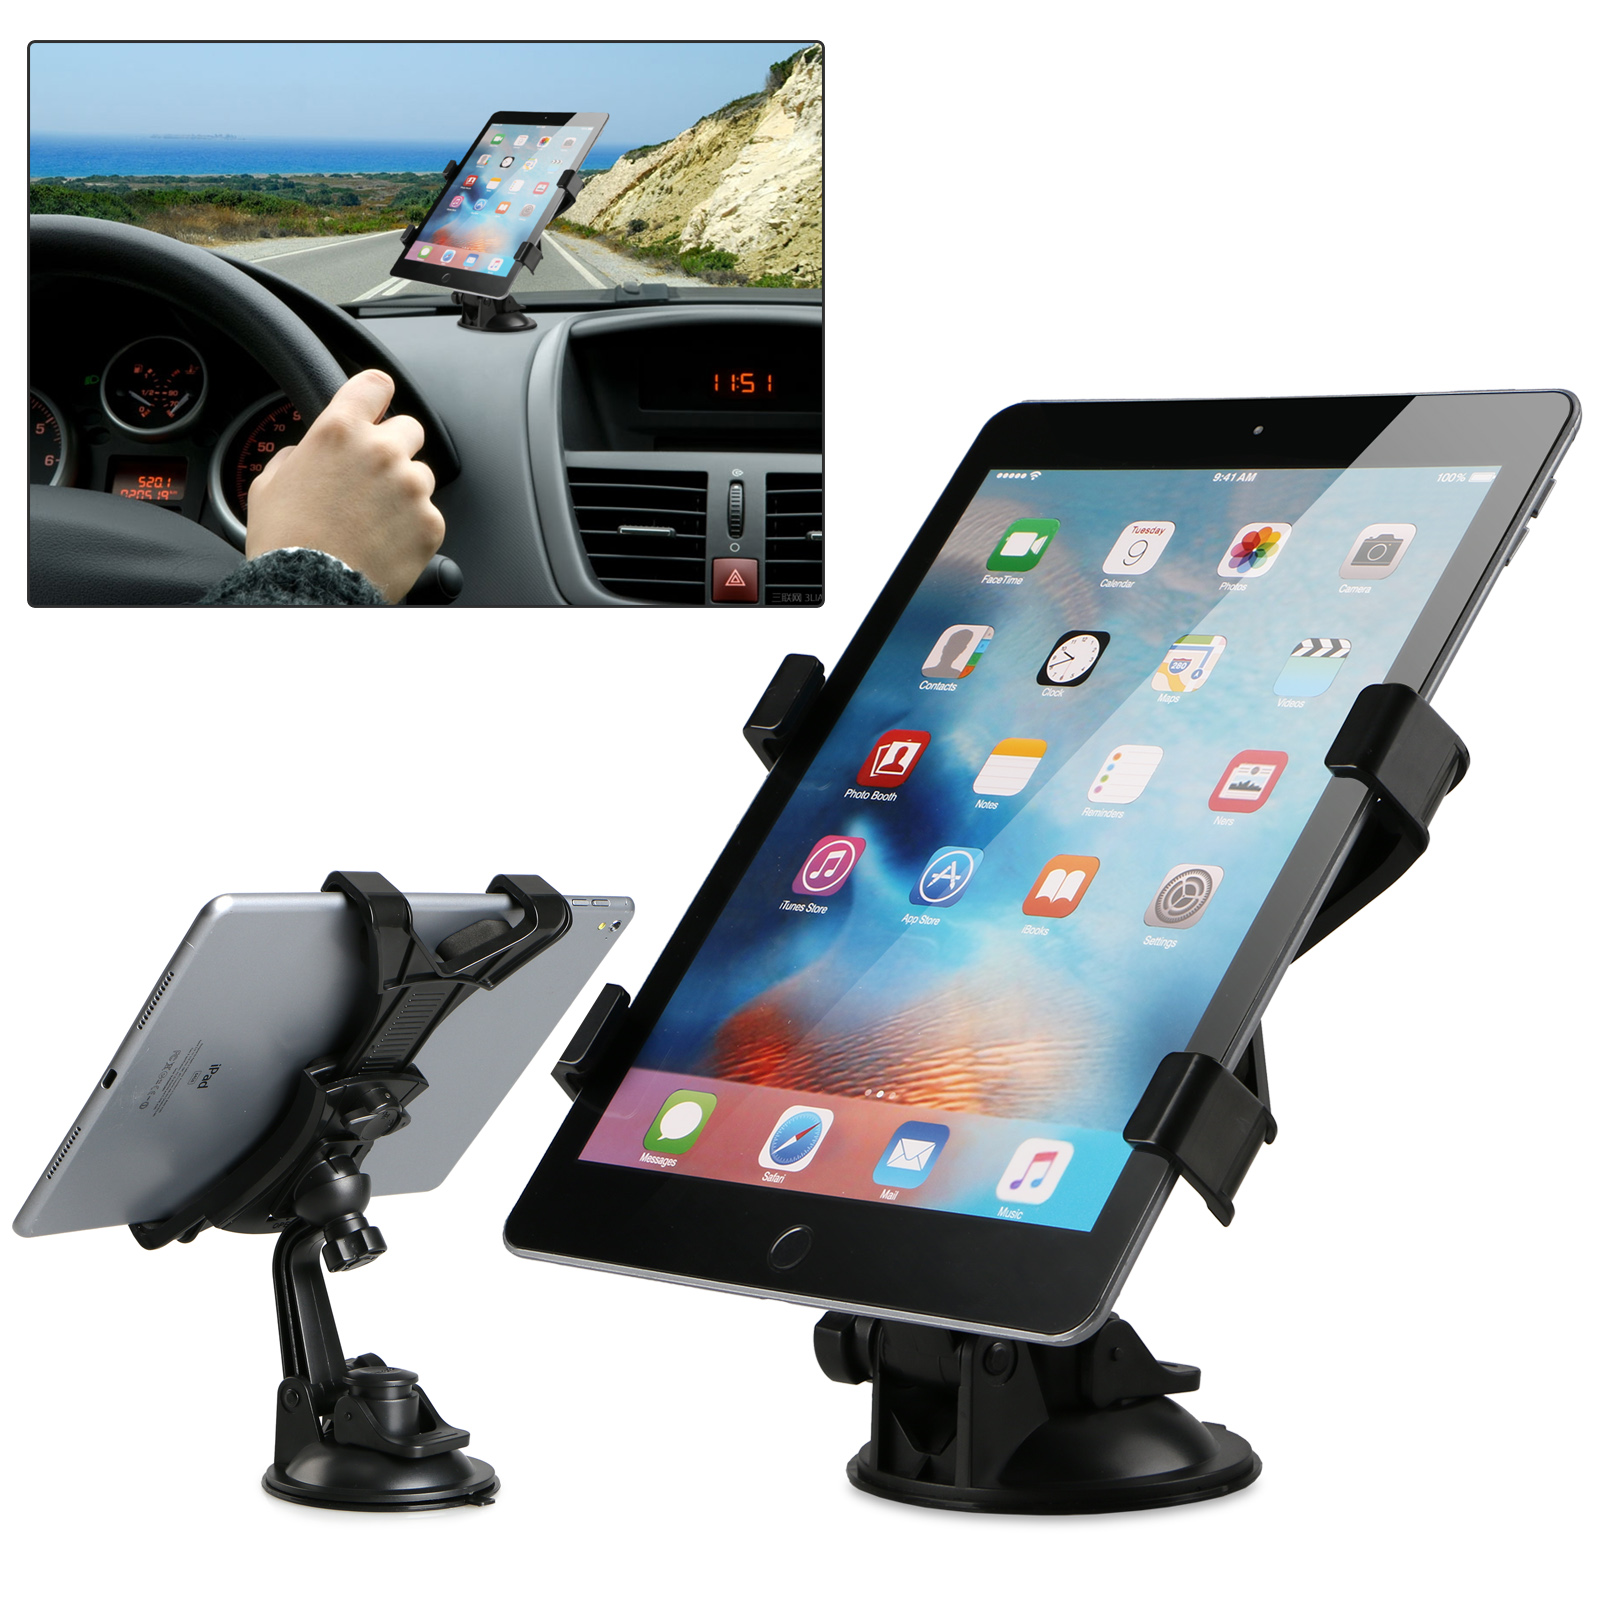 360 Rotating 7-10inch Tablet Car Windshield Instrument Bracket Mount Holder for iPad GPS